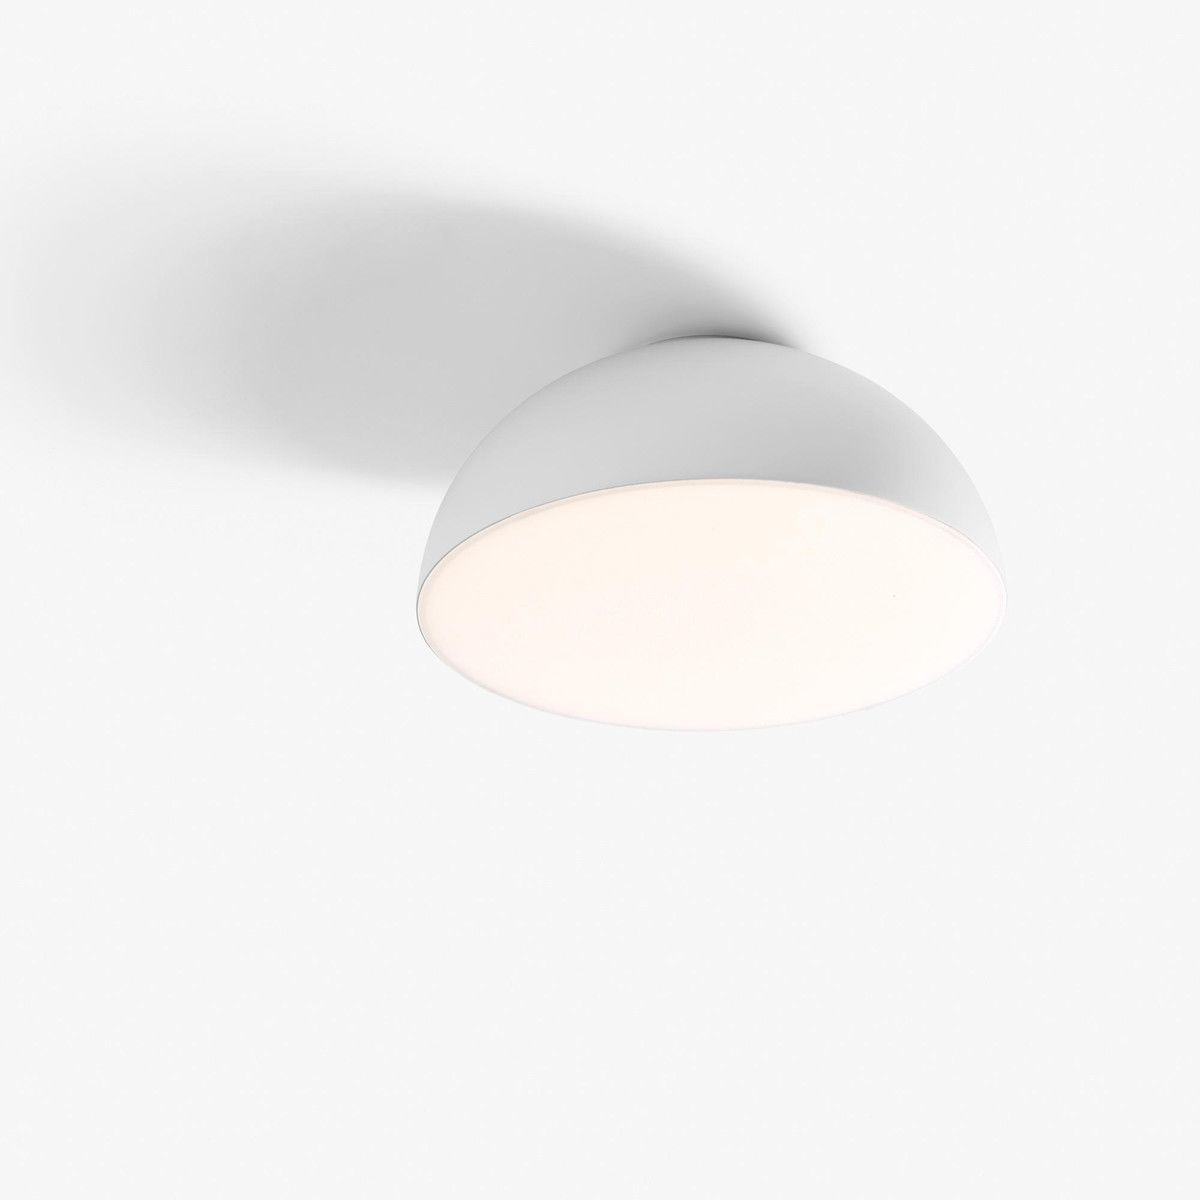 passepartout jh12 lampe murale plafonnier led andtradition. Black Bedroom Furniture Sets. Home Design Ideas